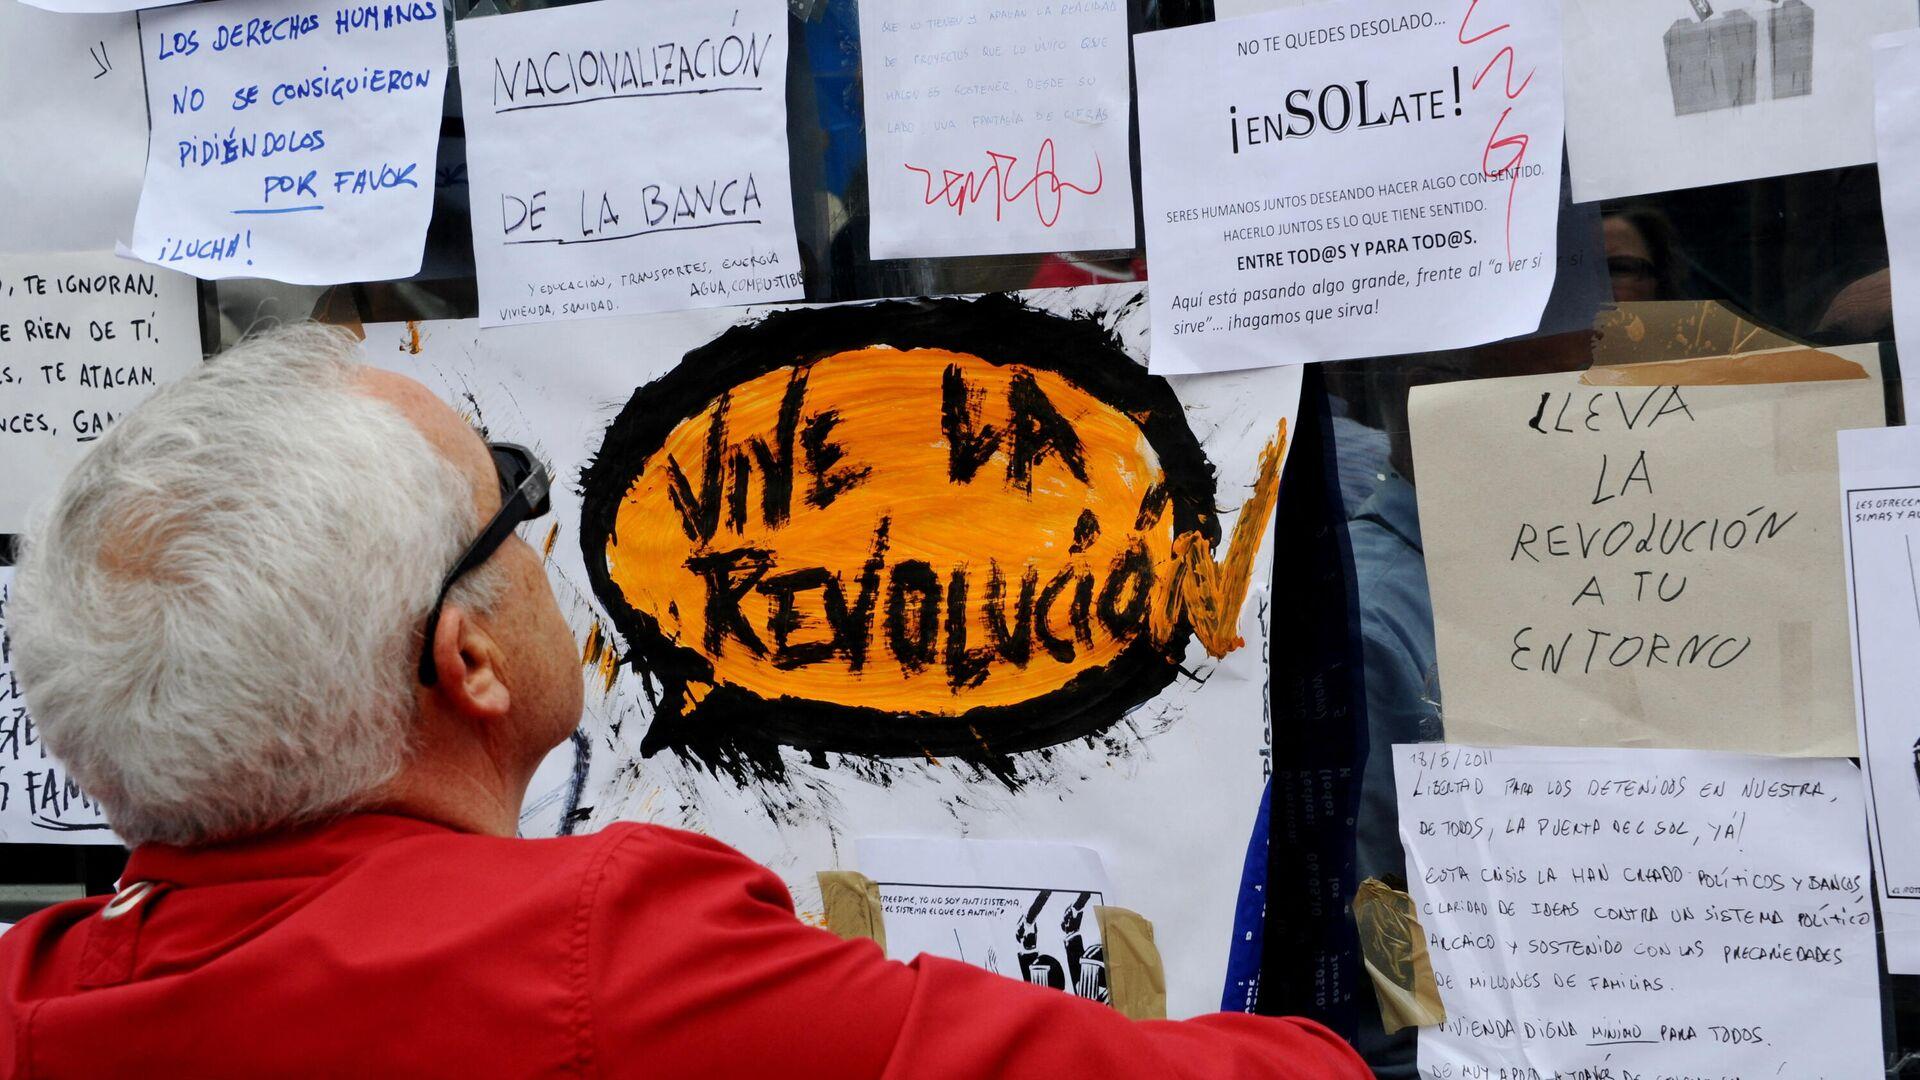 Protestas del 15-M en España - Sputnik Mundo, 1920, 14.05.2021